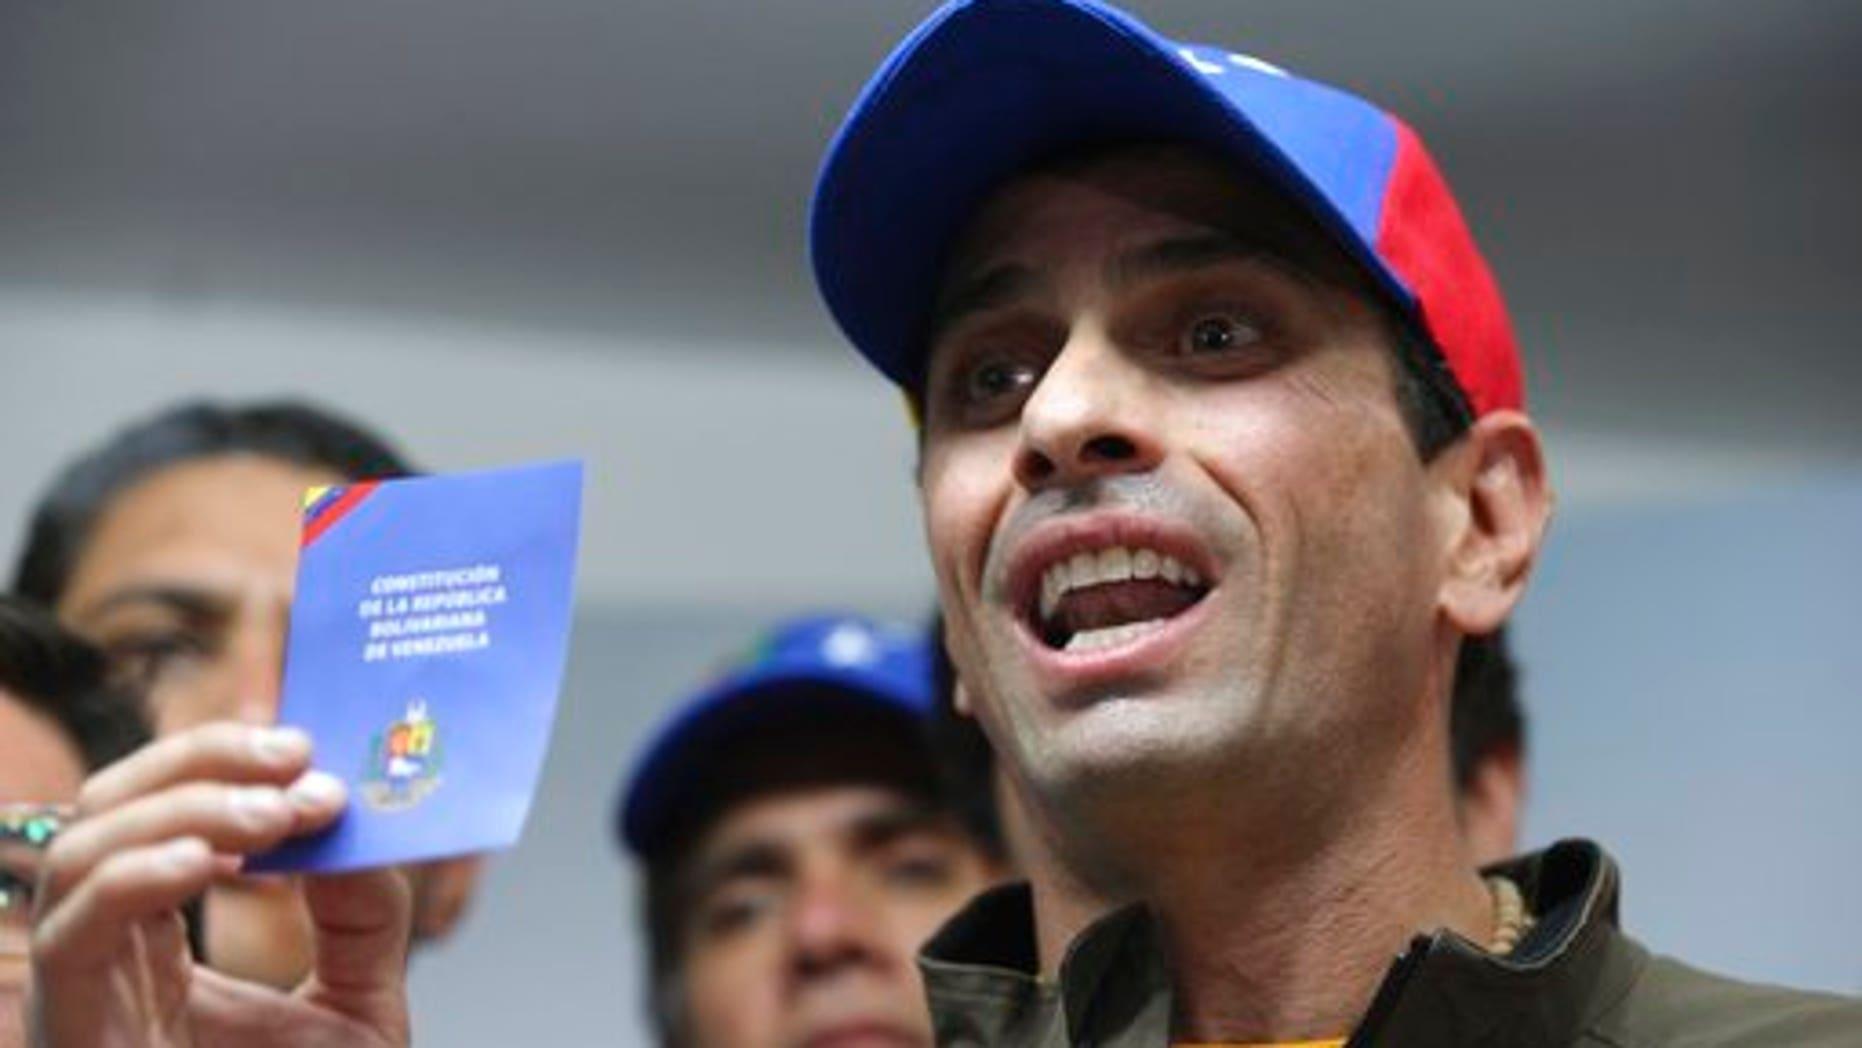 Opposition leader Henrique Capriles displays a copy of Venezuela's Constitution during a news conference in Caracas, Venezuela, Thursday, April 6, 2017.